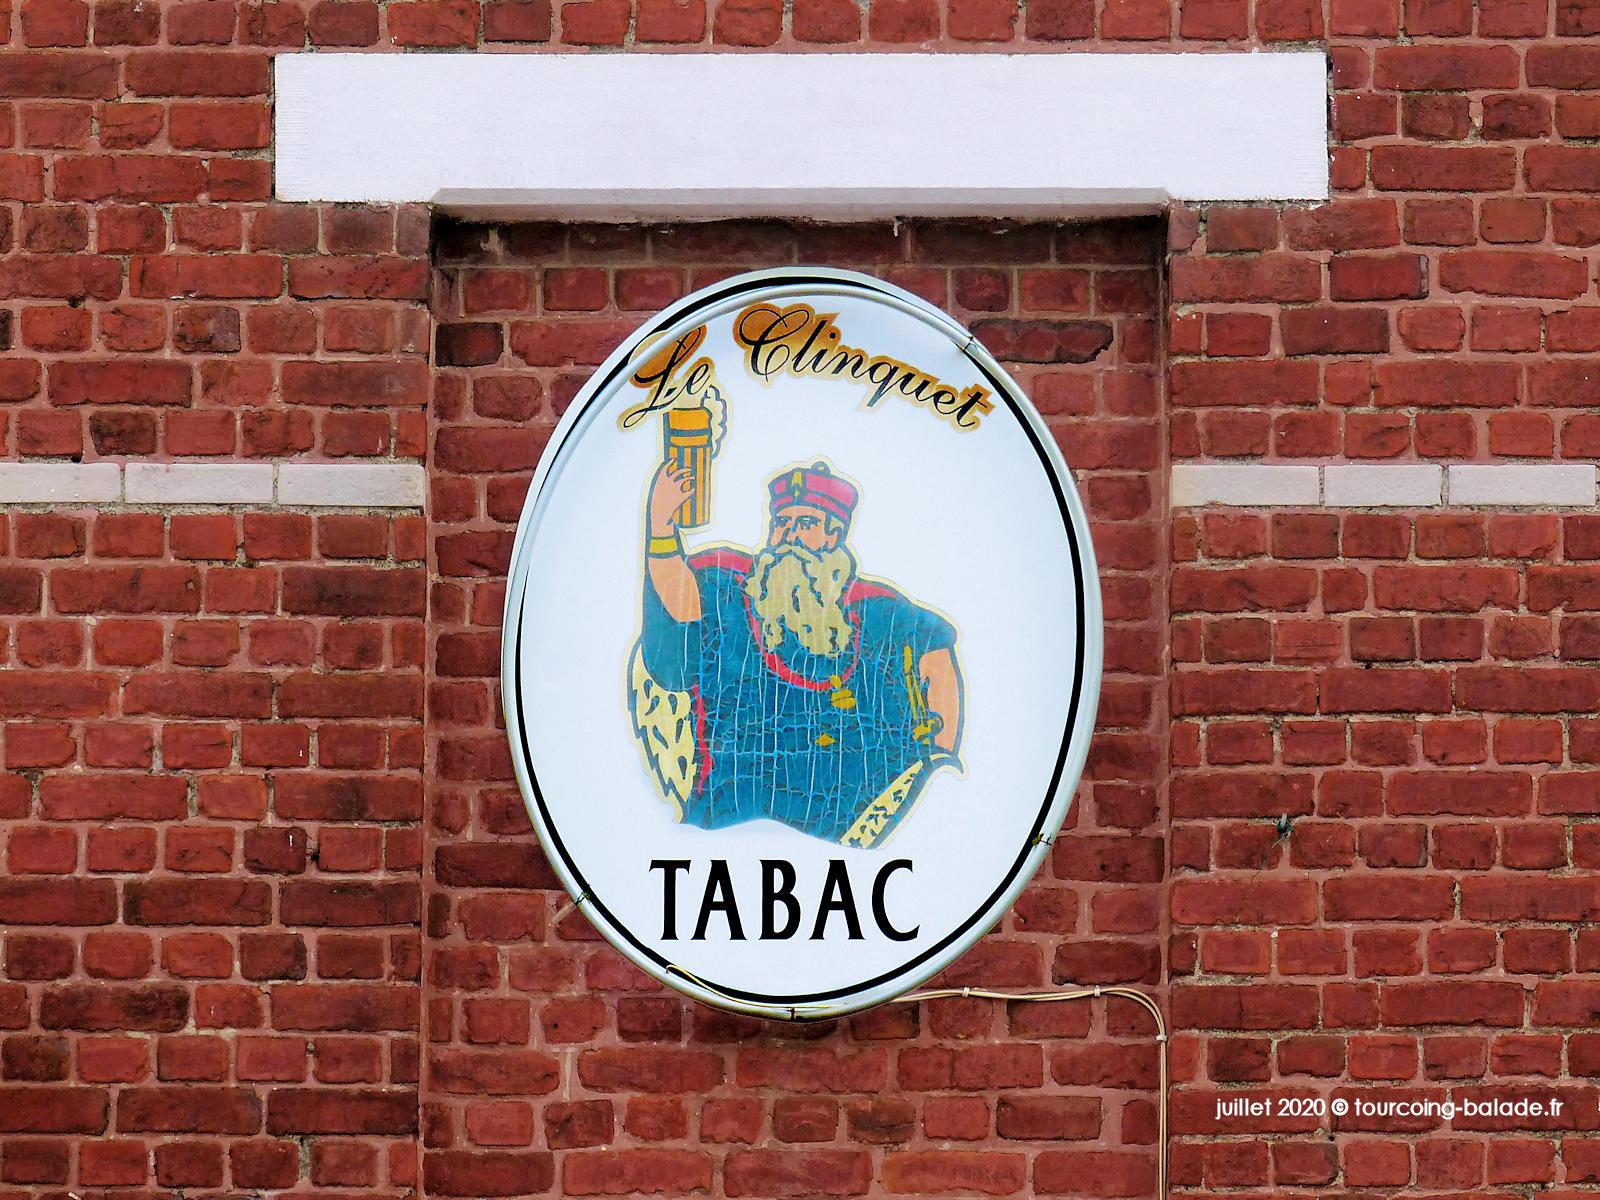 Enseigne du Bistrot Tabac Le Clinquet, Tourcoing 2020